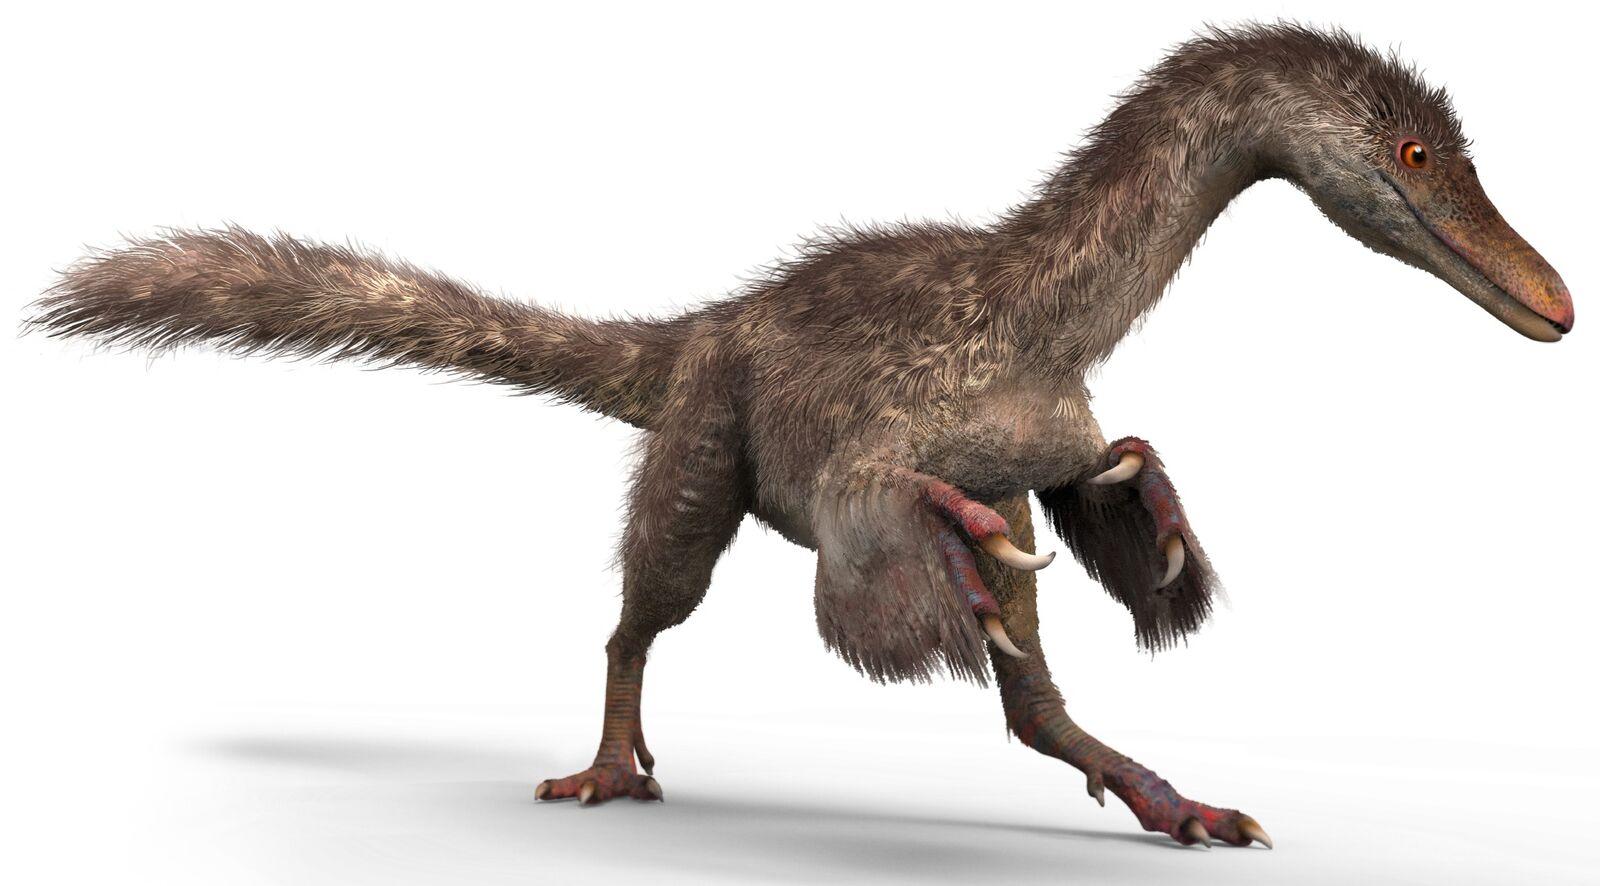 A small coelurosaur dinosaur